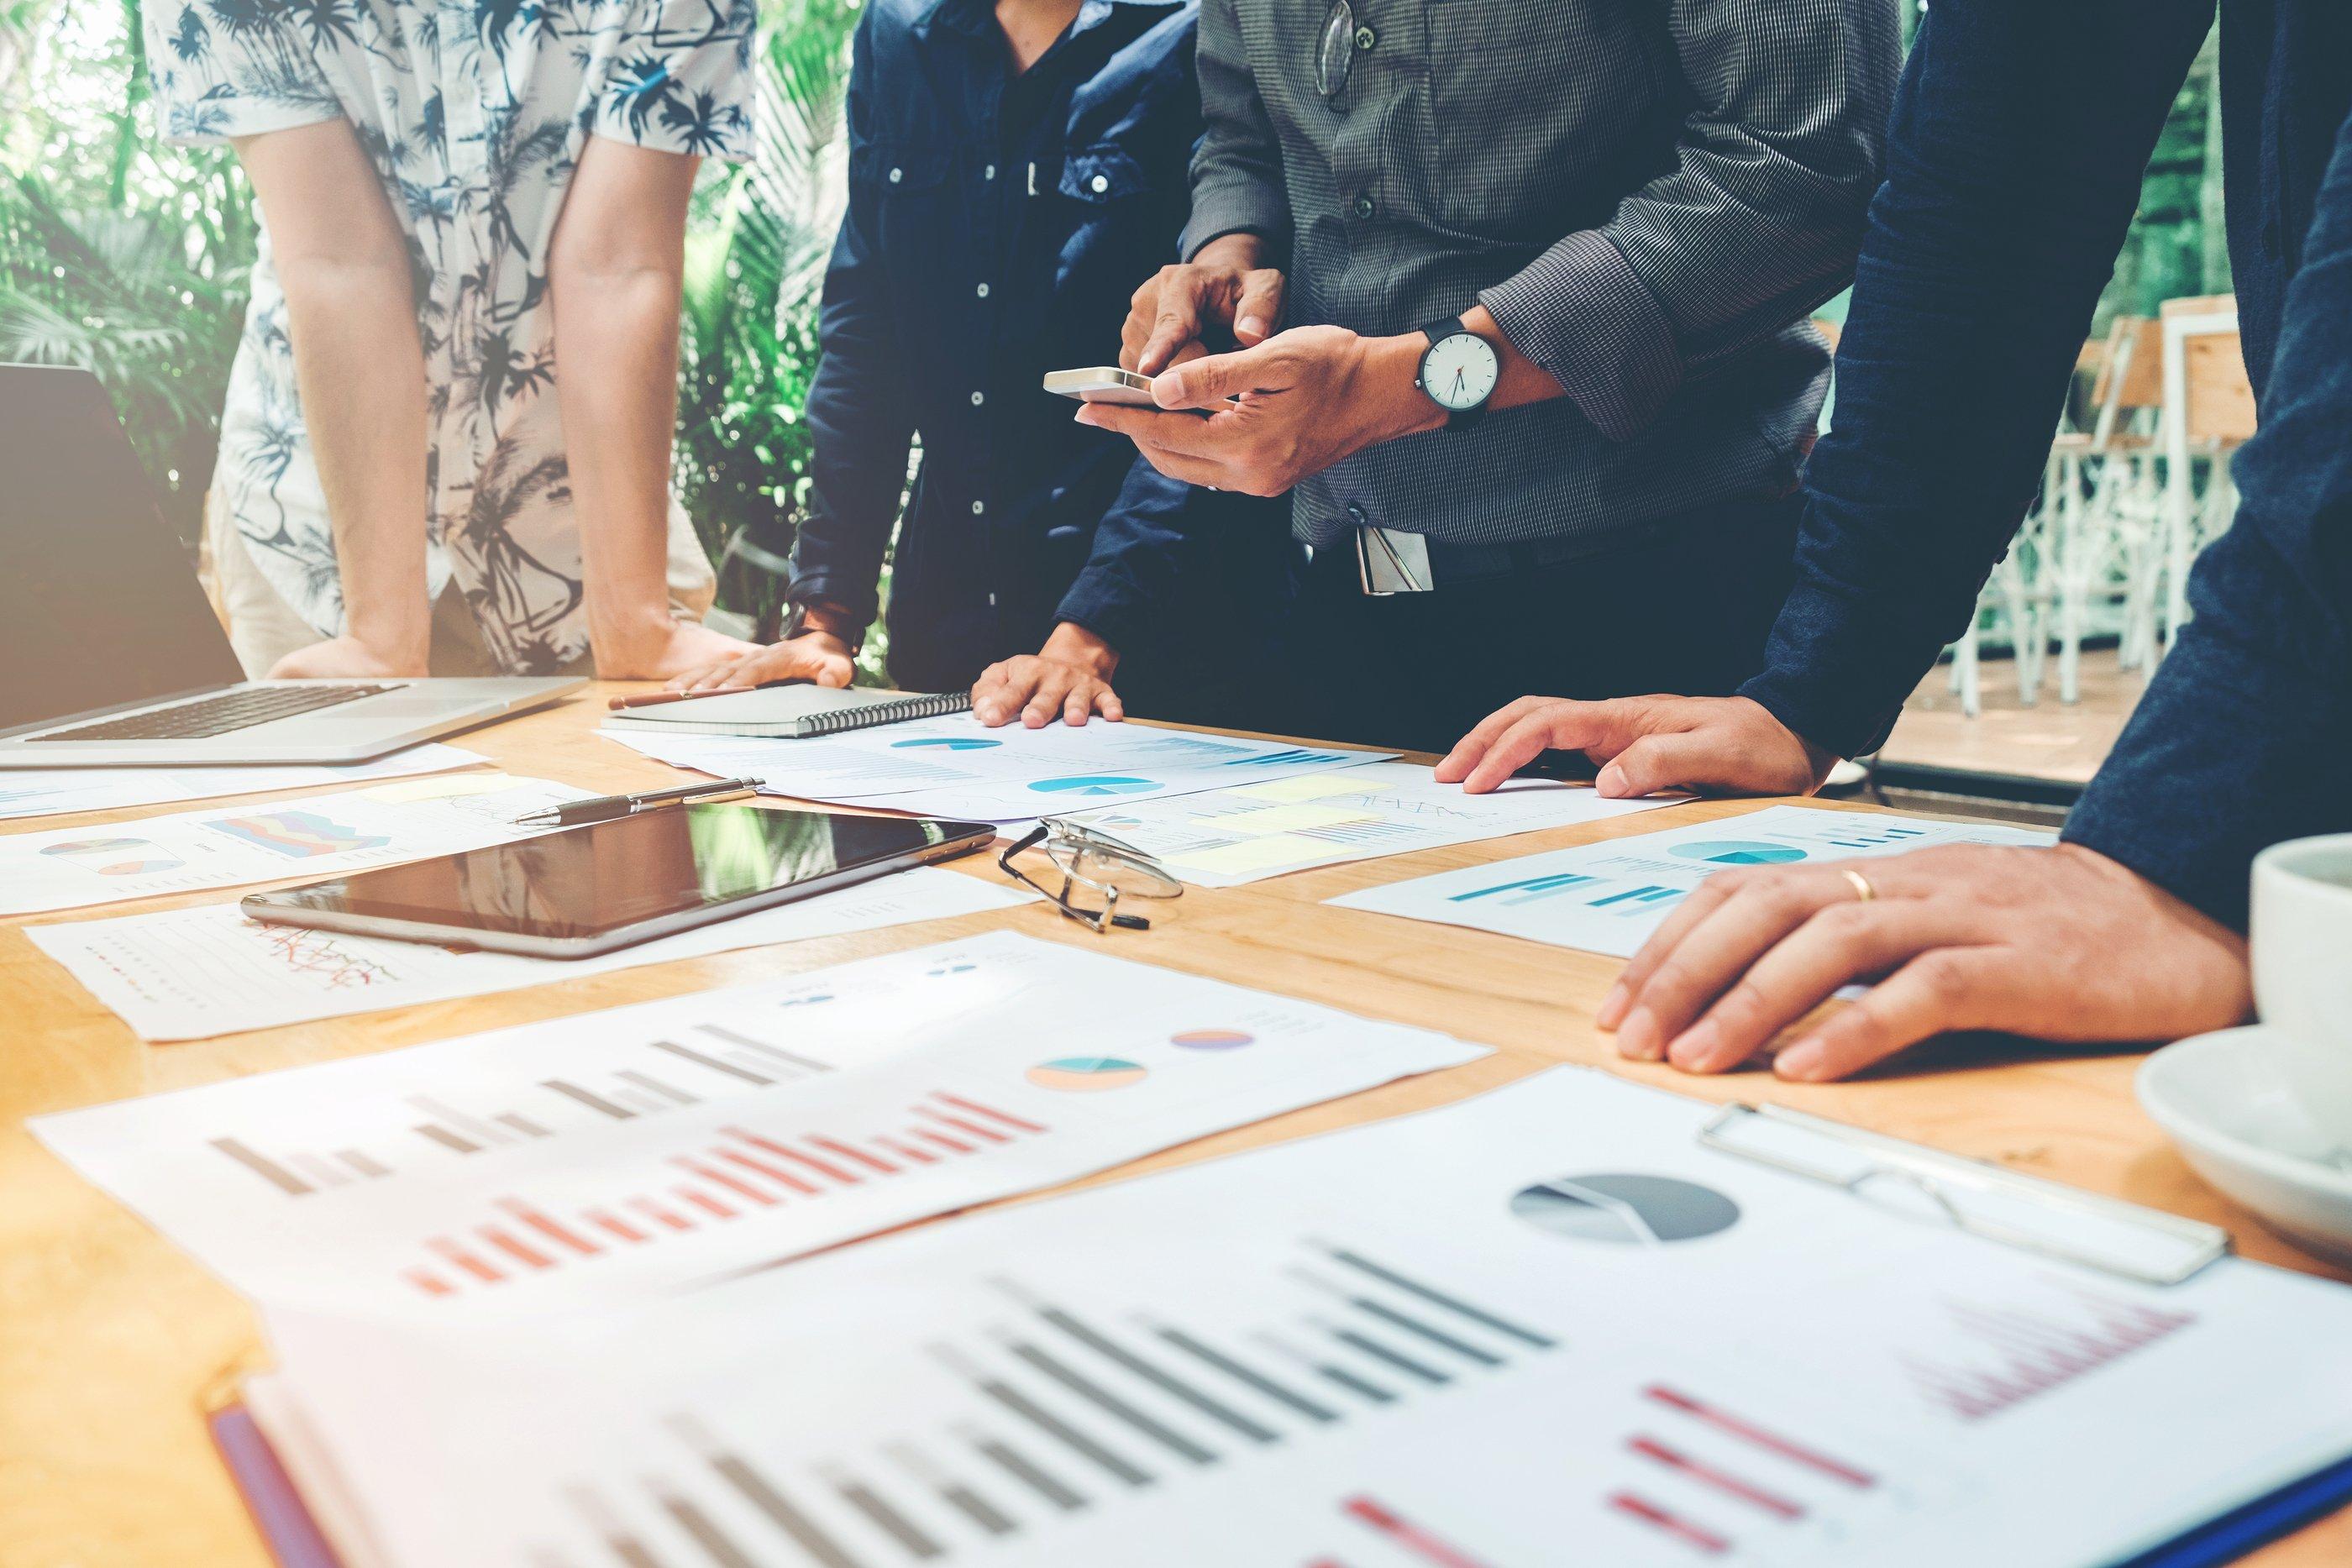 bigstock-Start-Up-Business-Team-Colleag-200077270